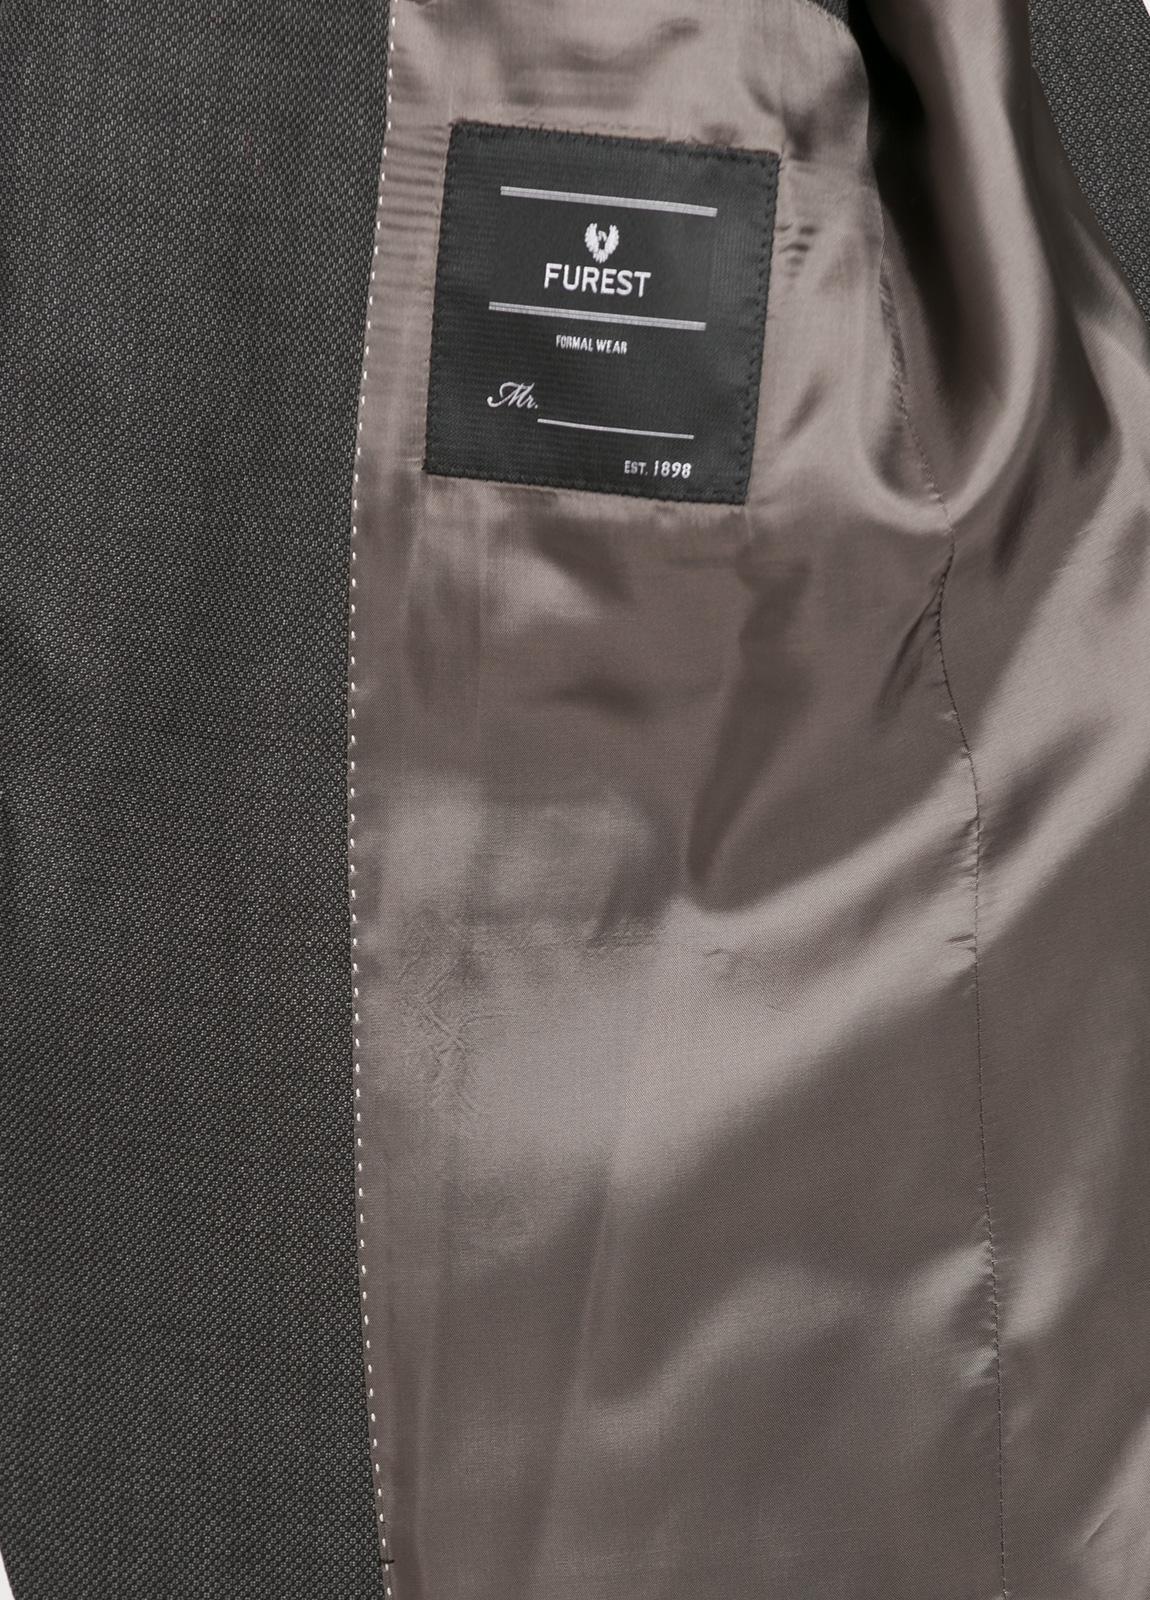 Traje liso SLIM FIT, tejido GUABELLO color gris marengo, 100% Lana. - Ítem4